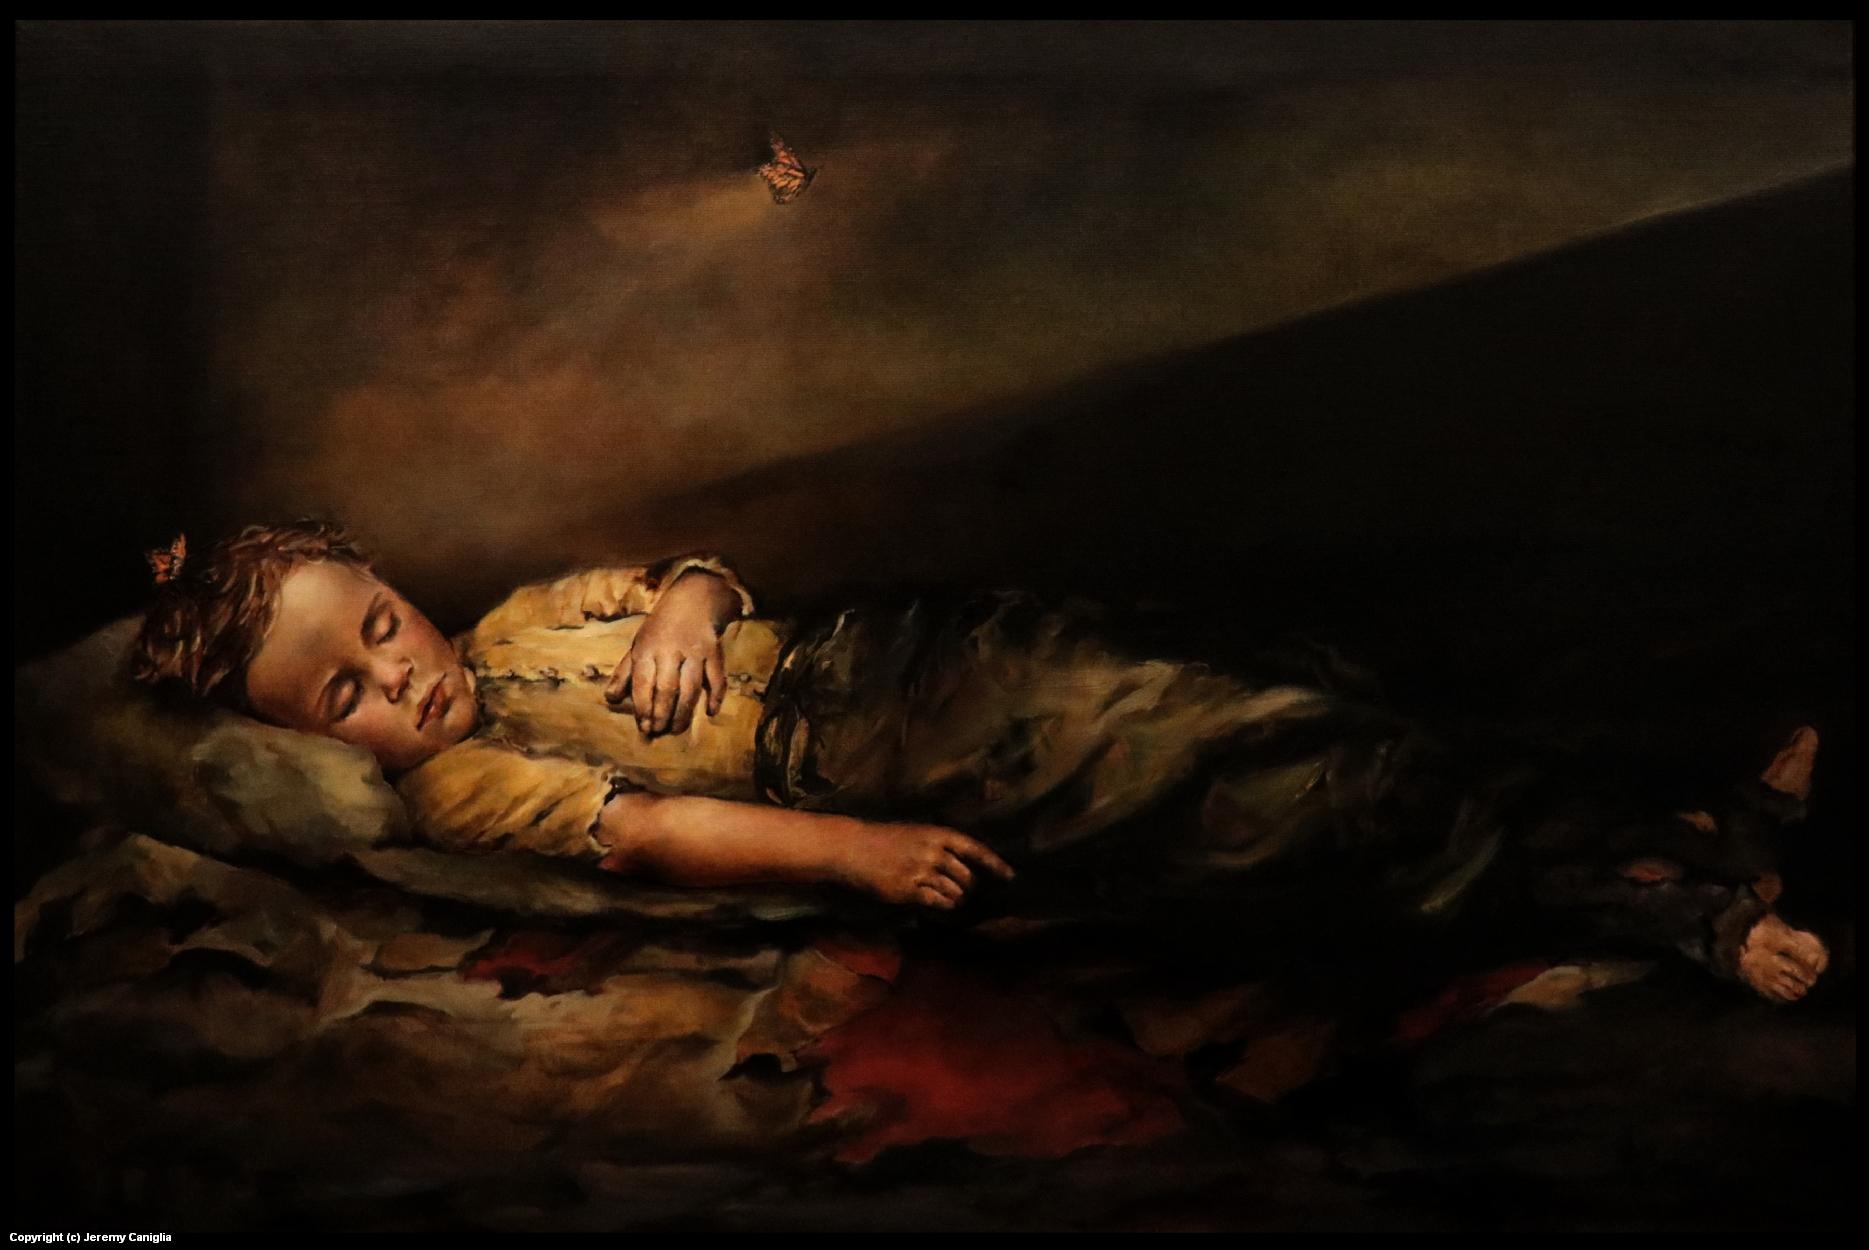 The Sick Child  Artwork by Jeremy  Caniglia